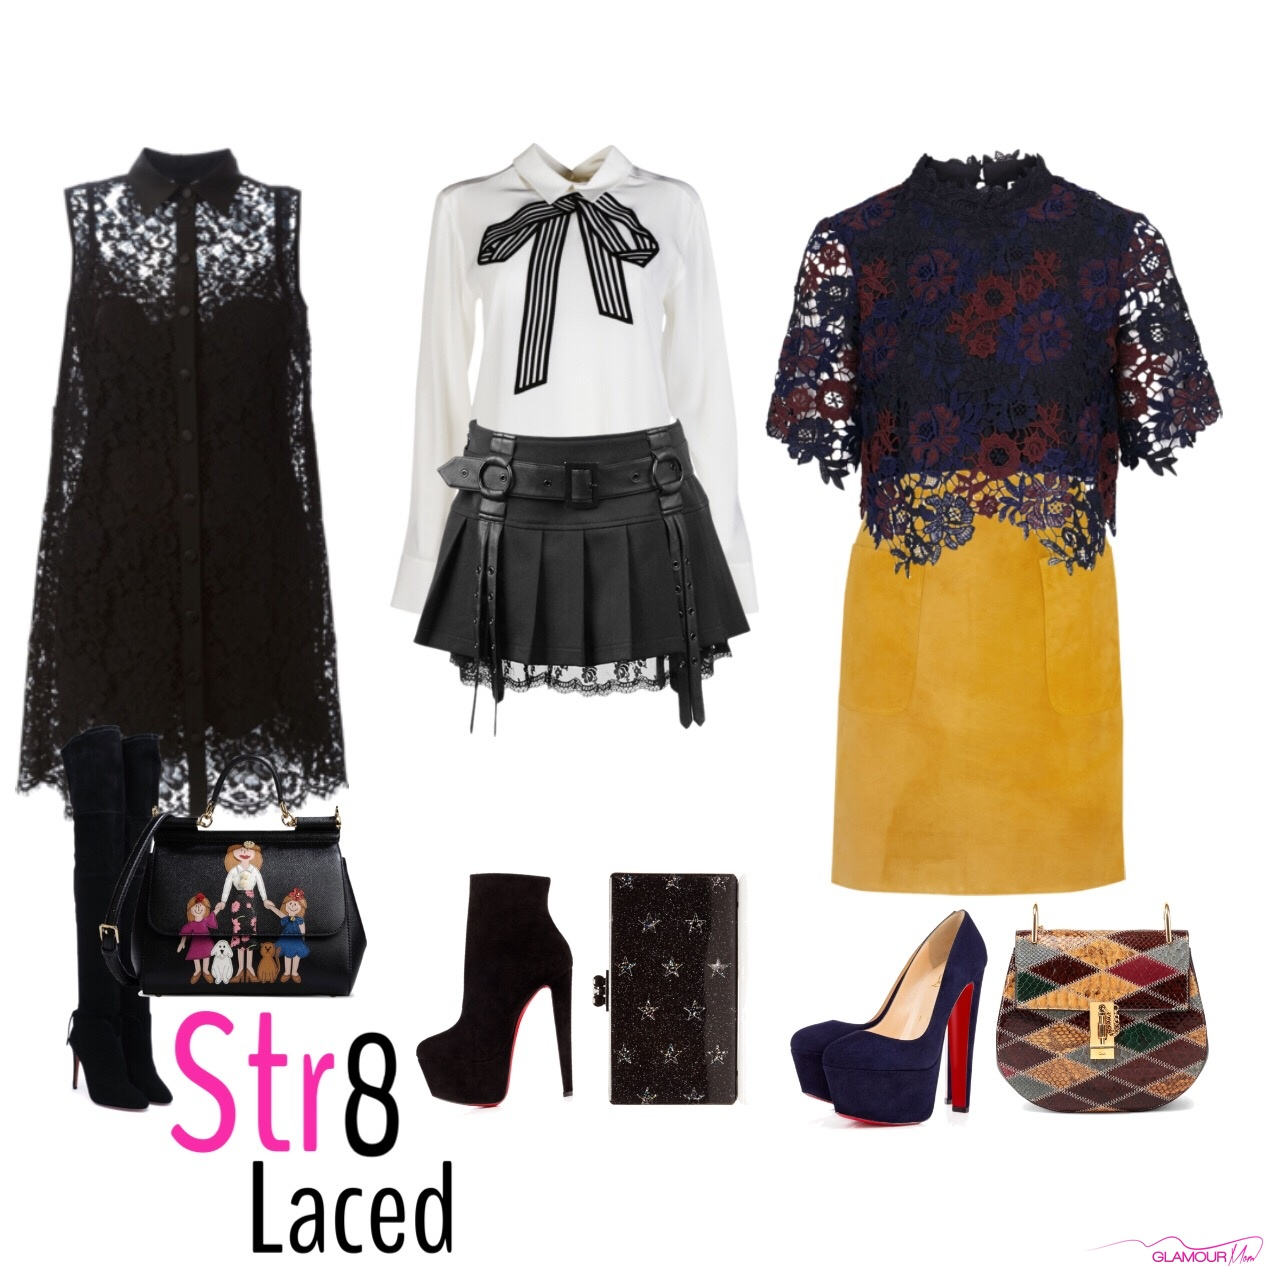 BlackGlamourMom Trend Alert: Str8 Laced